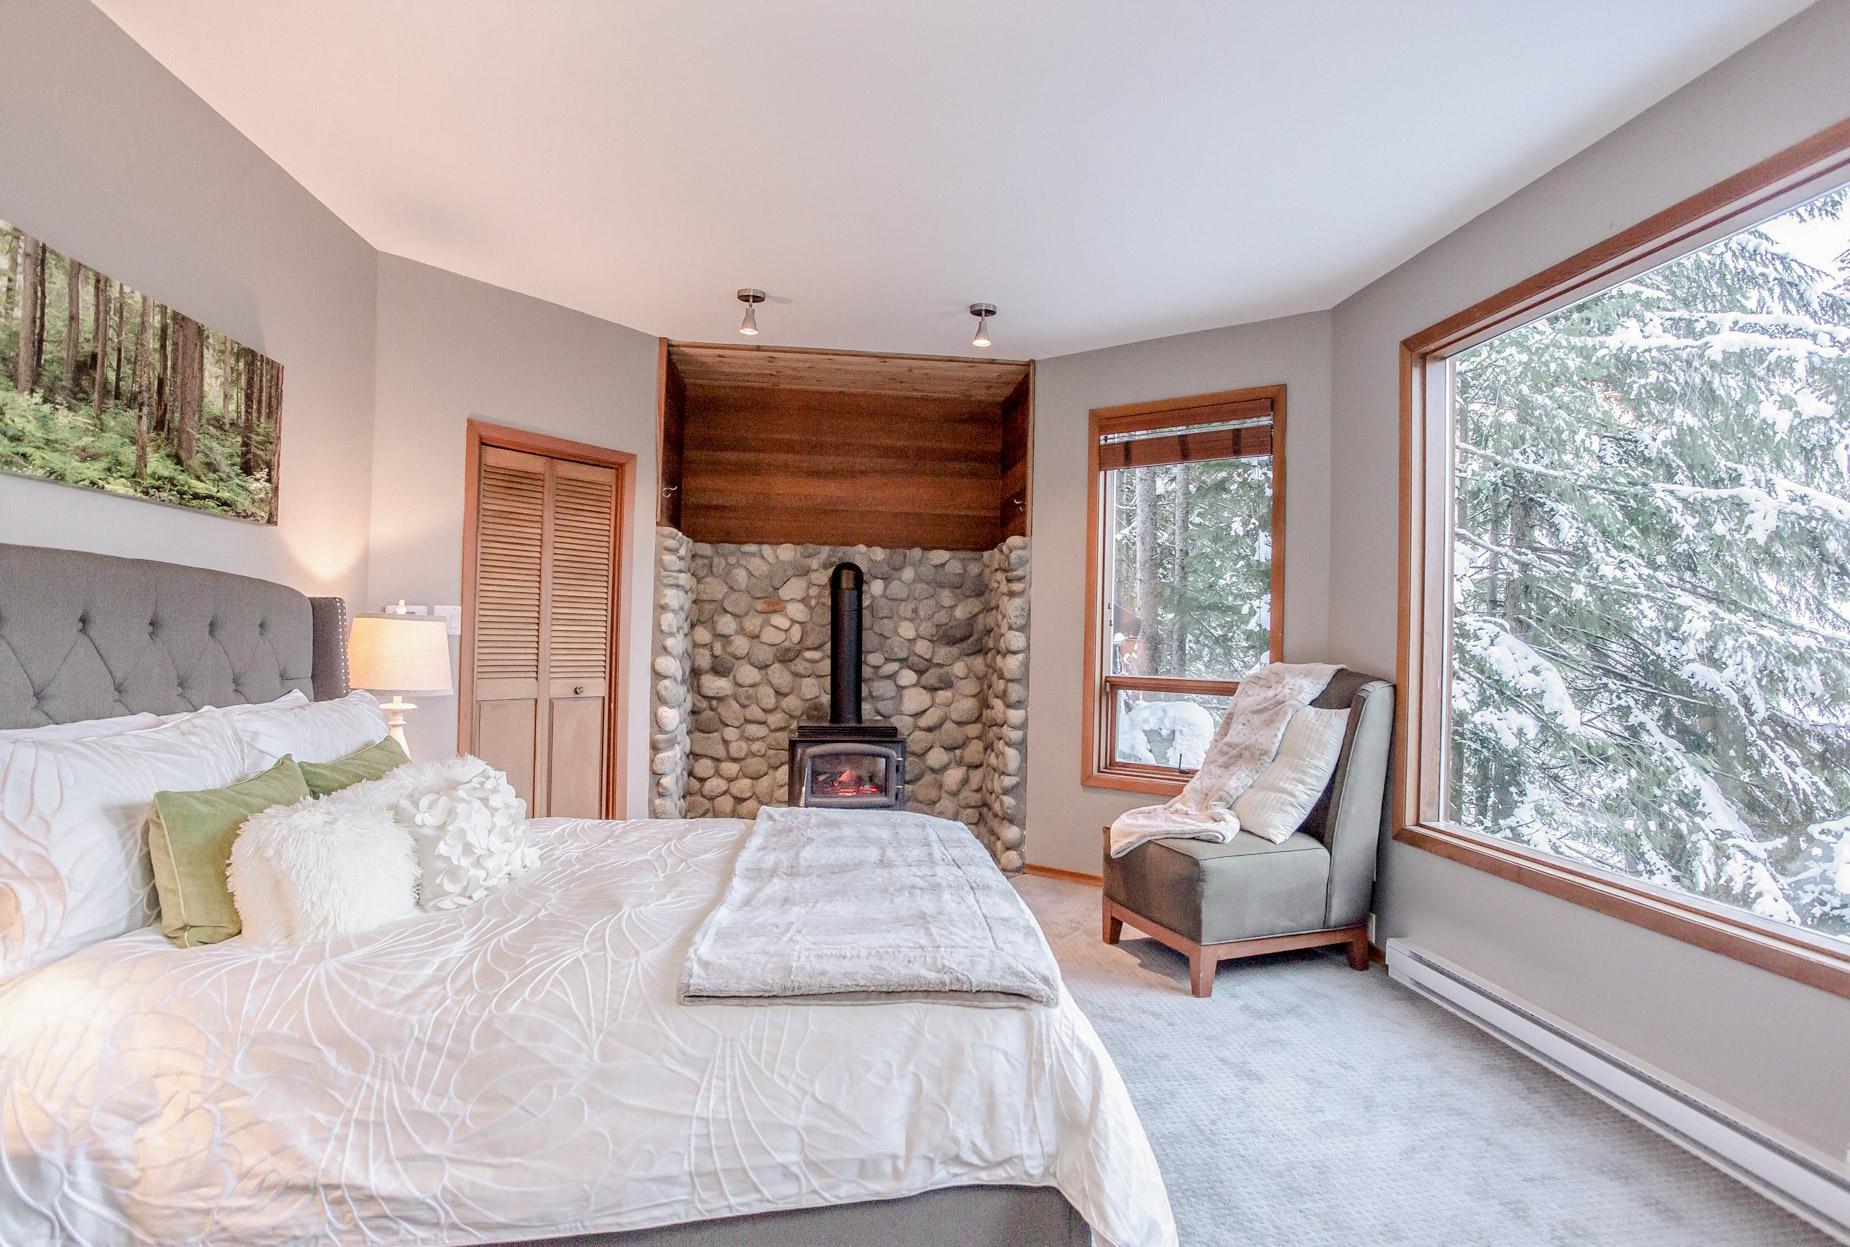 Aurora Lodge - Bedroom 7